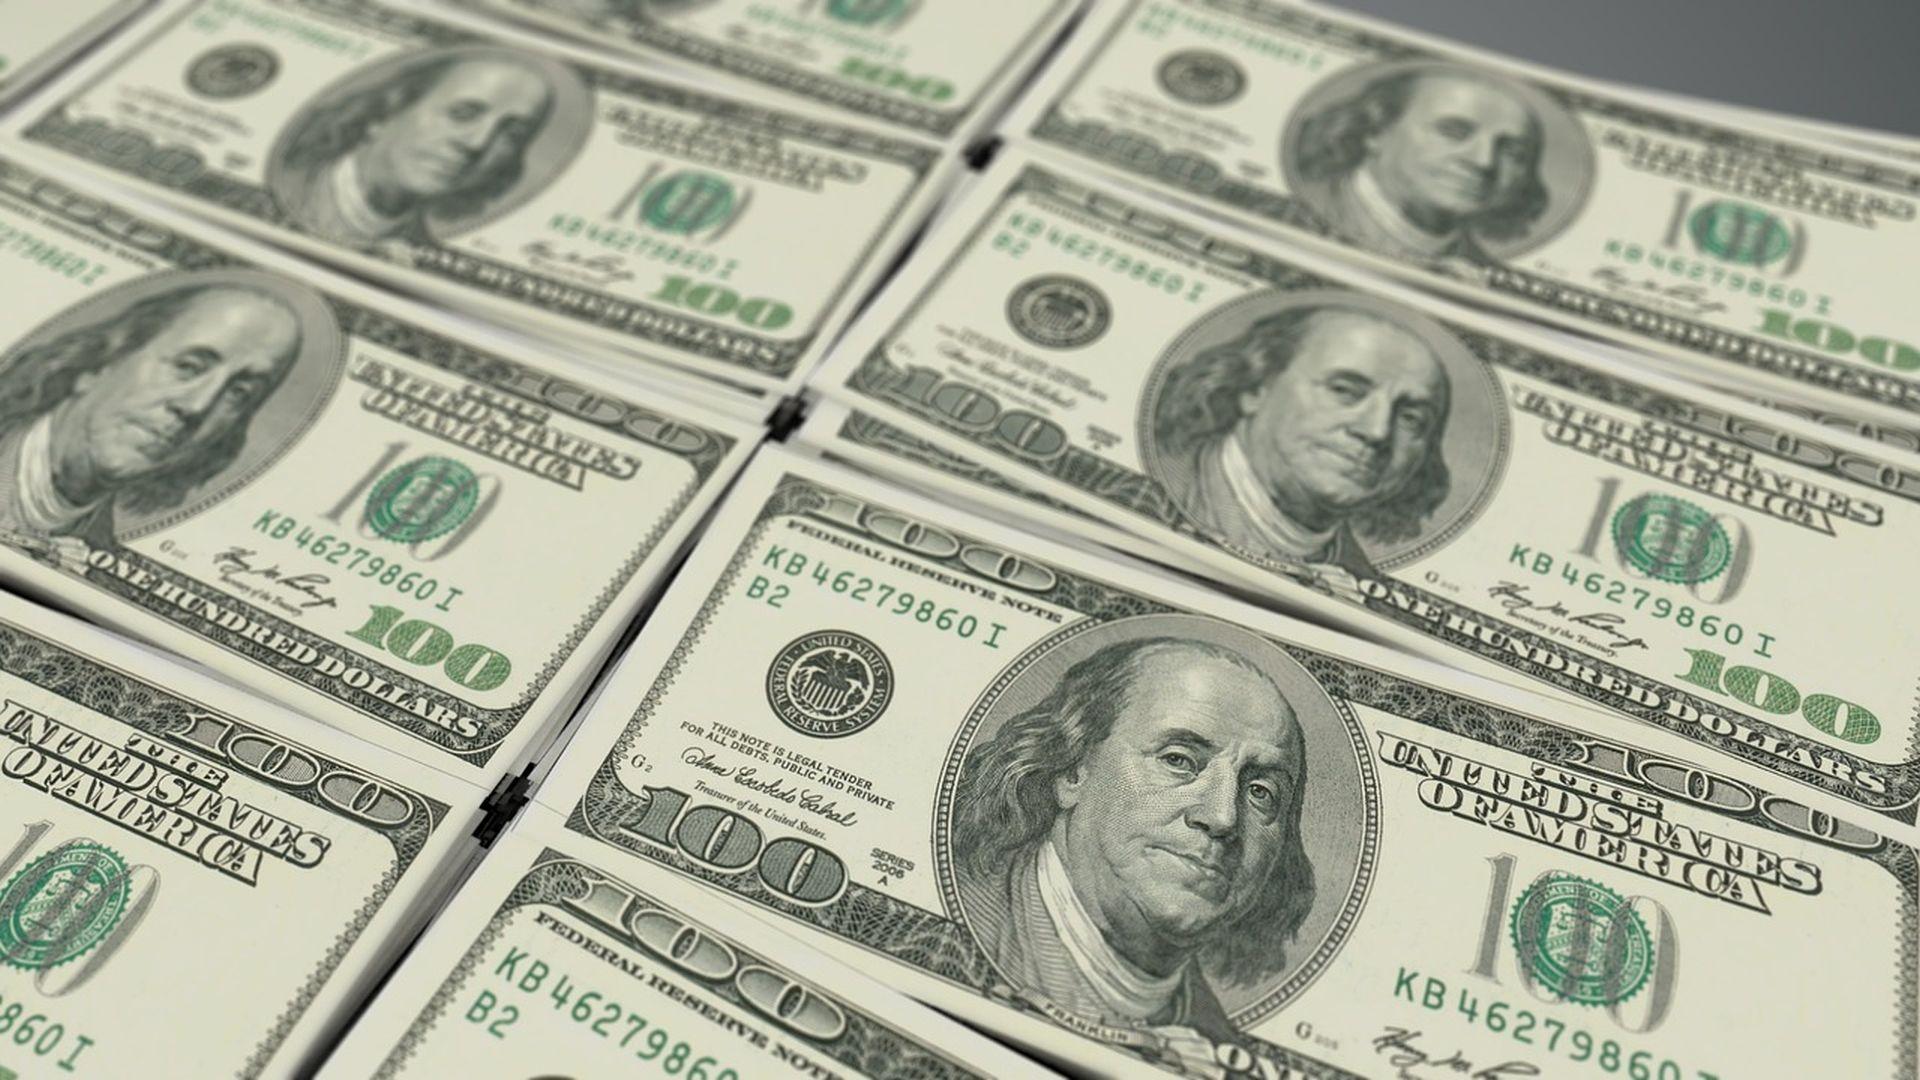 S. Koreja mora platiti 501 mil. dolara zbog smrti Warmbiera